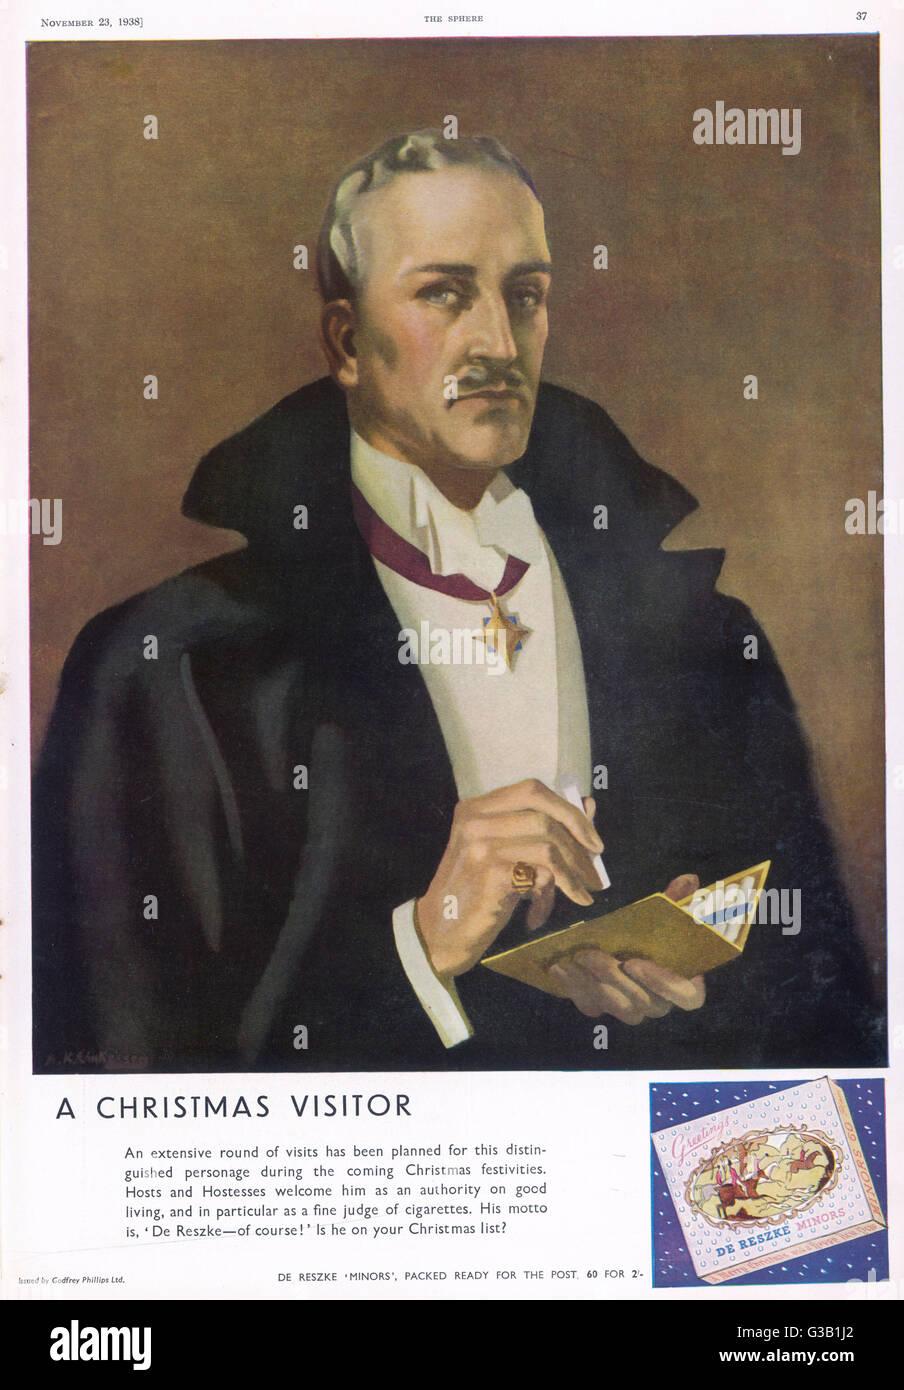 De Reszke cigarettes -  a distinguished personage        Date: 1934 - Stock Image